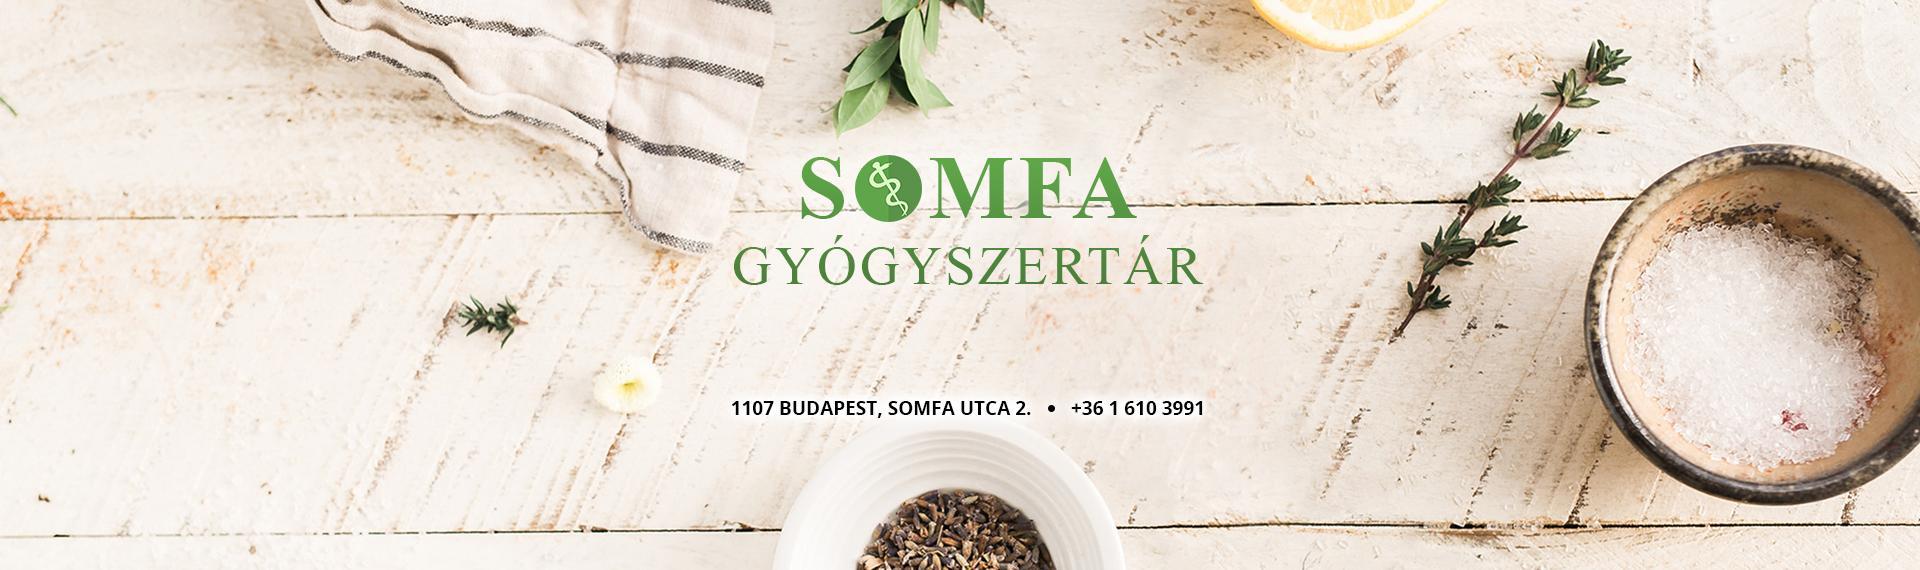 somfa-patika-header-01-1.jpg